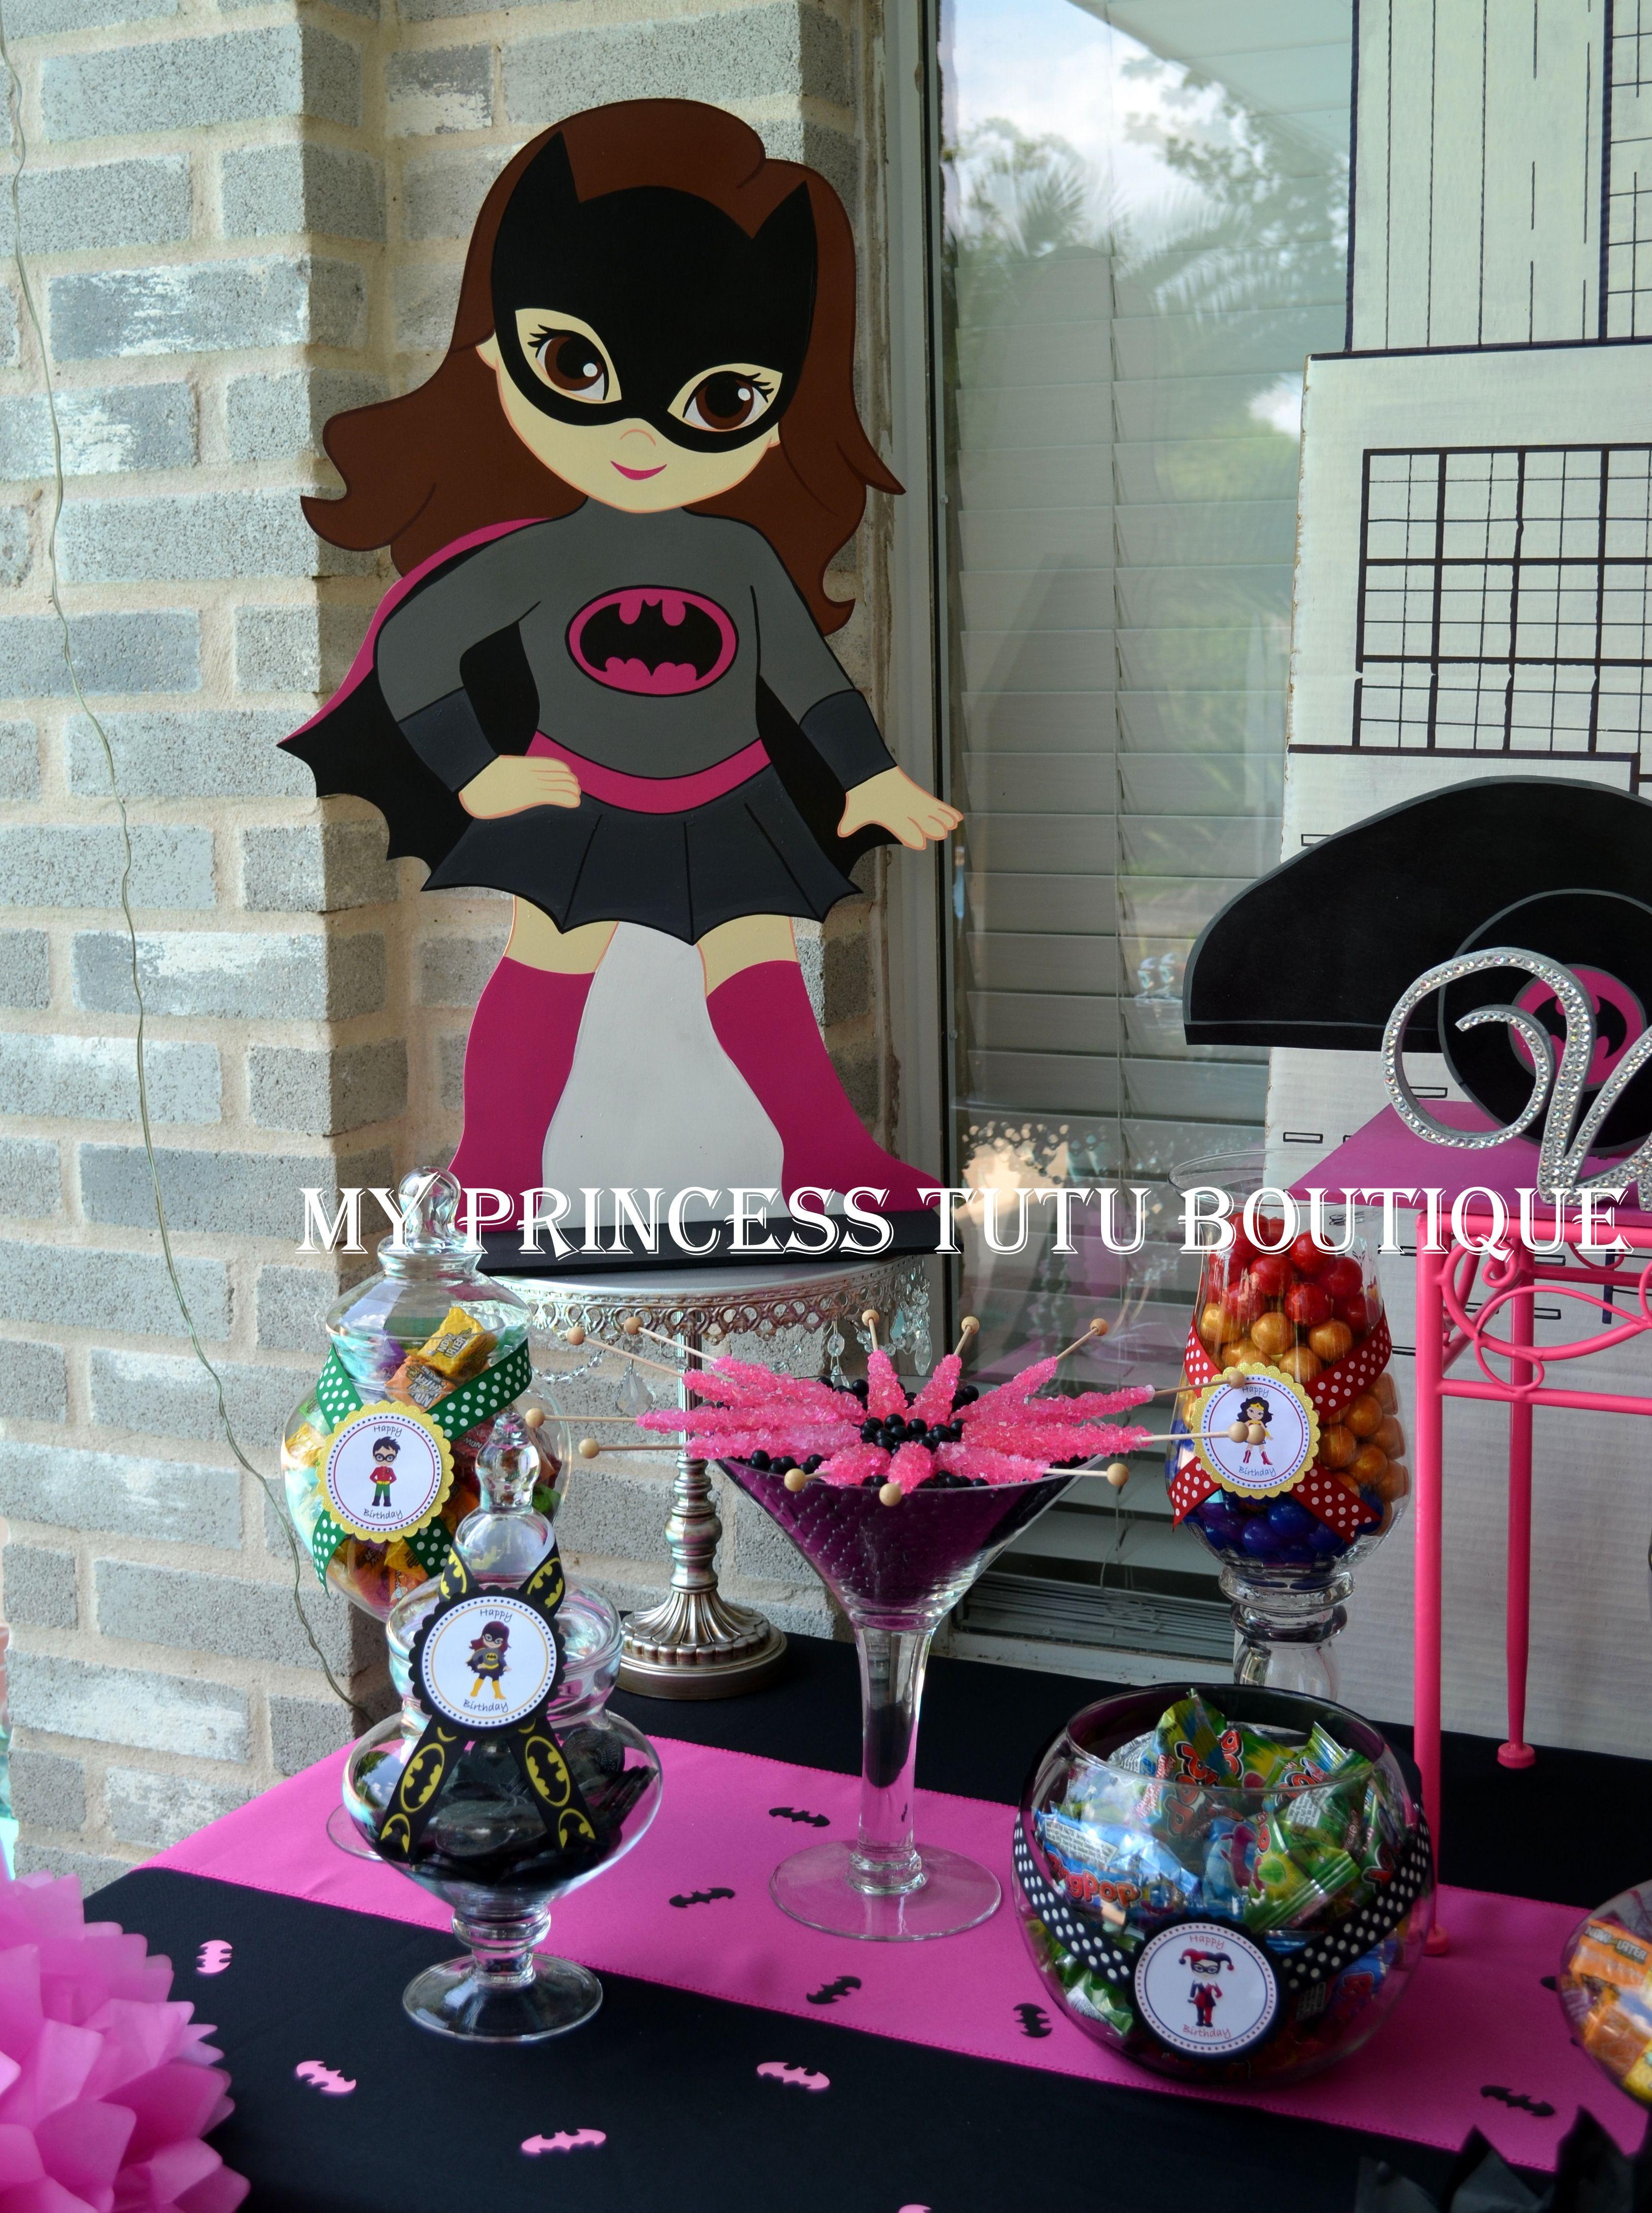 Batgirl Pool Party Invitation Batgirl Water Party DC hero super girls Party 354 Batgirl Invitation Batgirl Pool Party Birthday